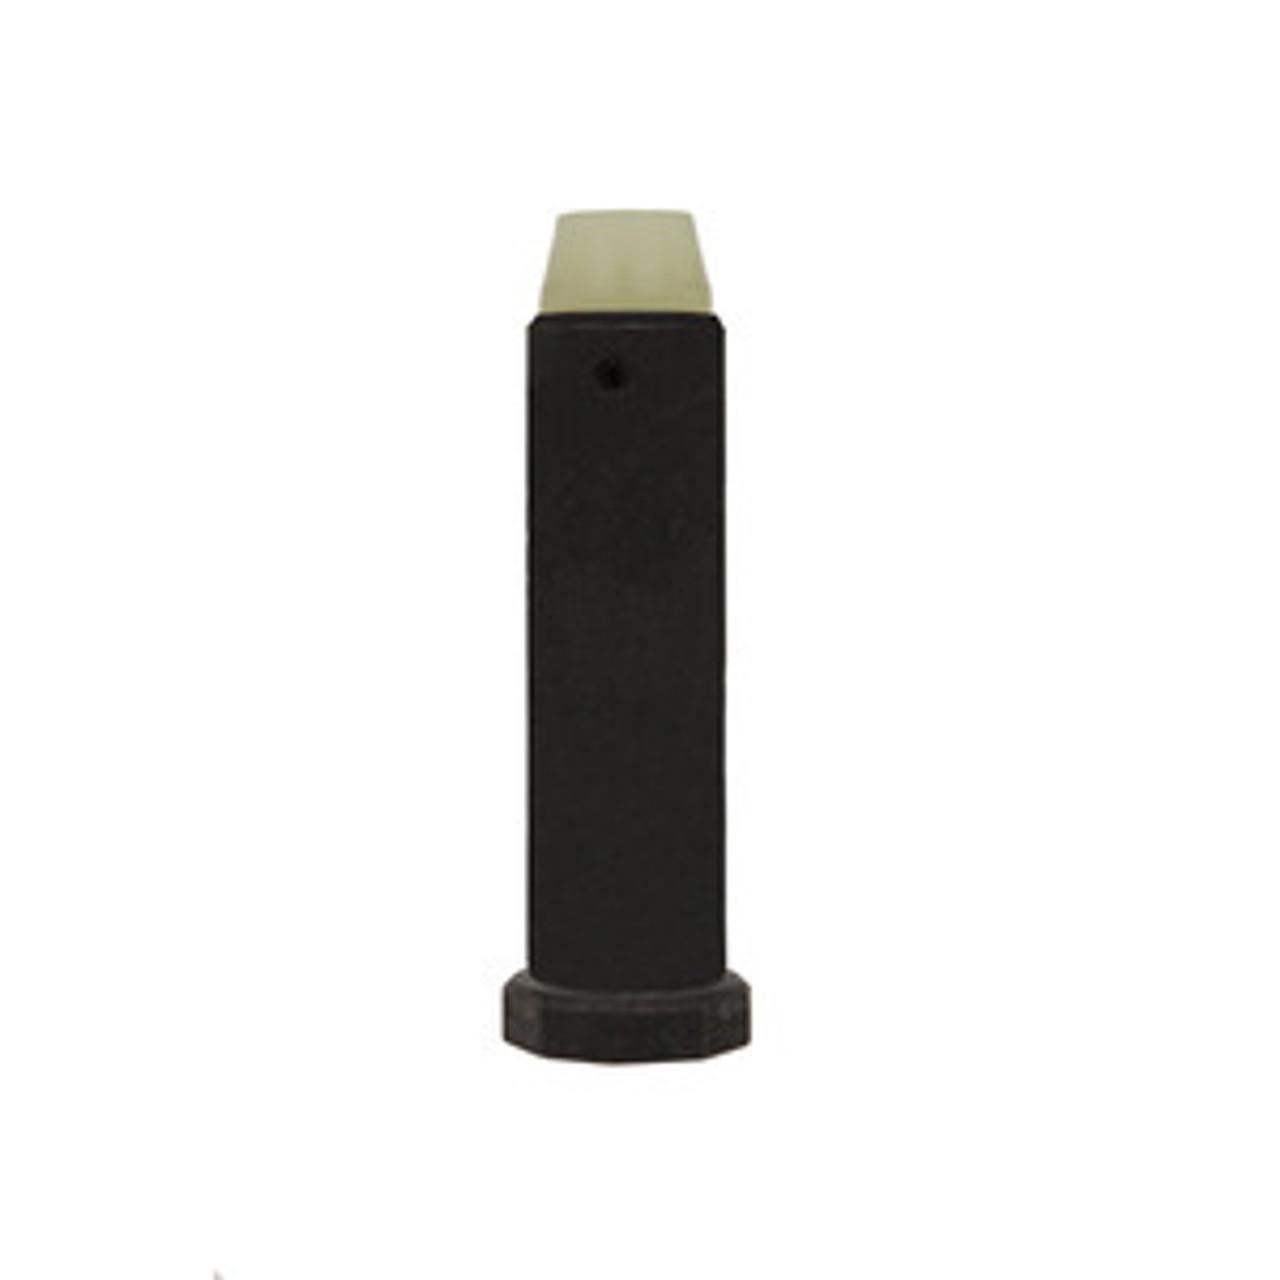 CMMG 9mm Heavy Buffer - MK9